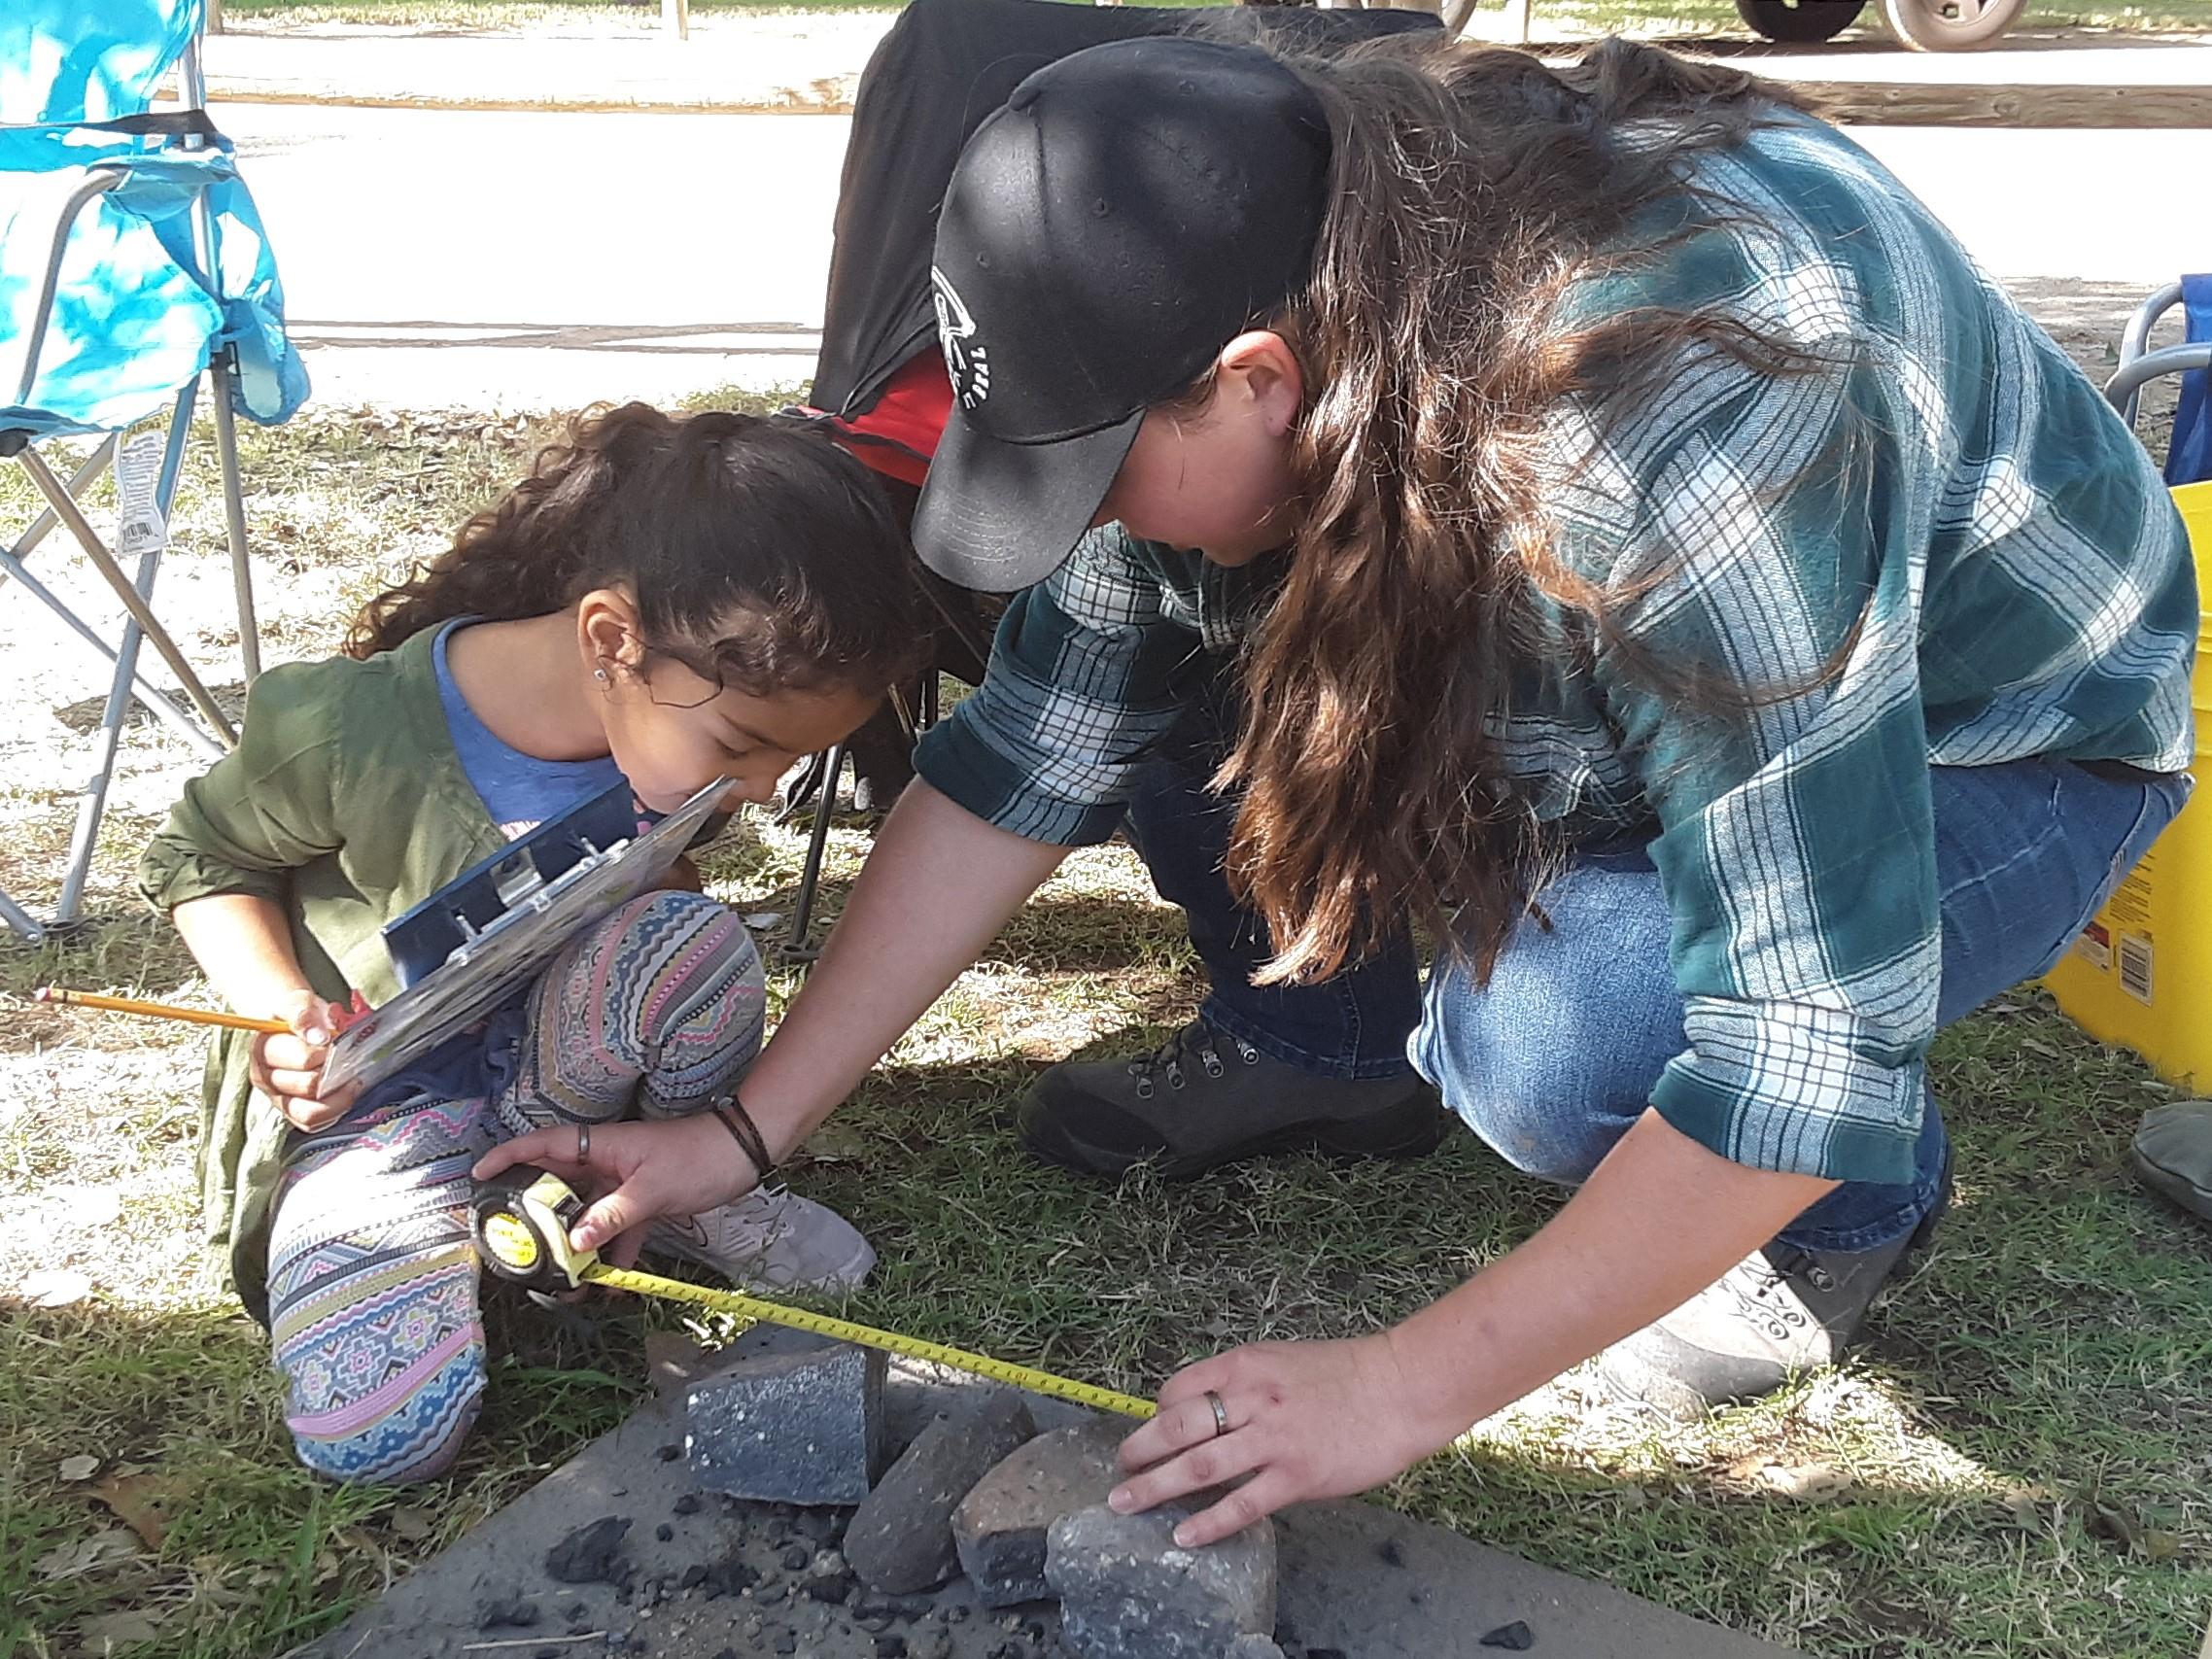 Future Archaeologist. Photo courtesy of ElizabethLawlor/AIA-Riverside Society.